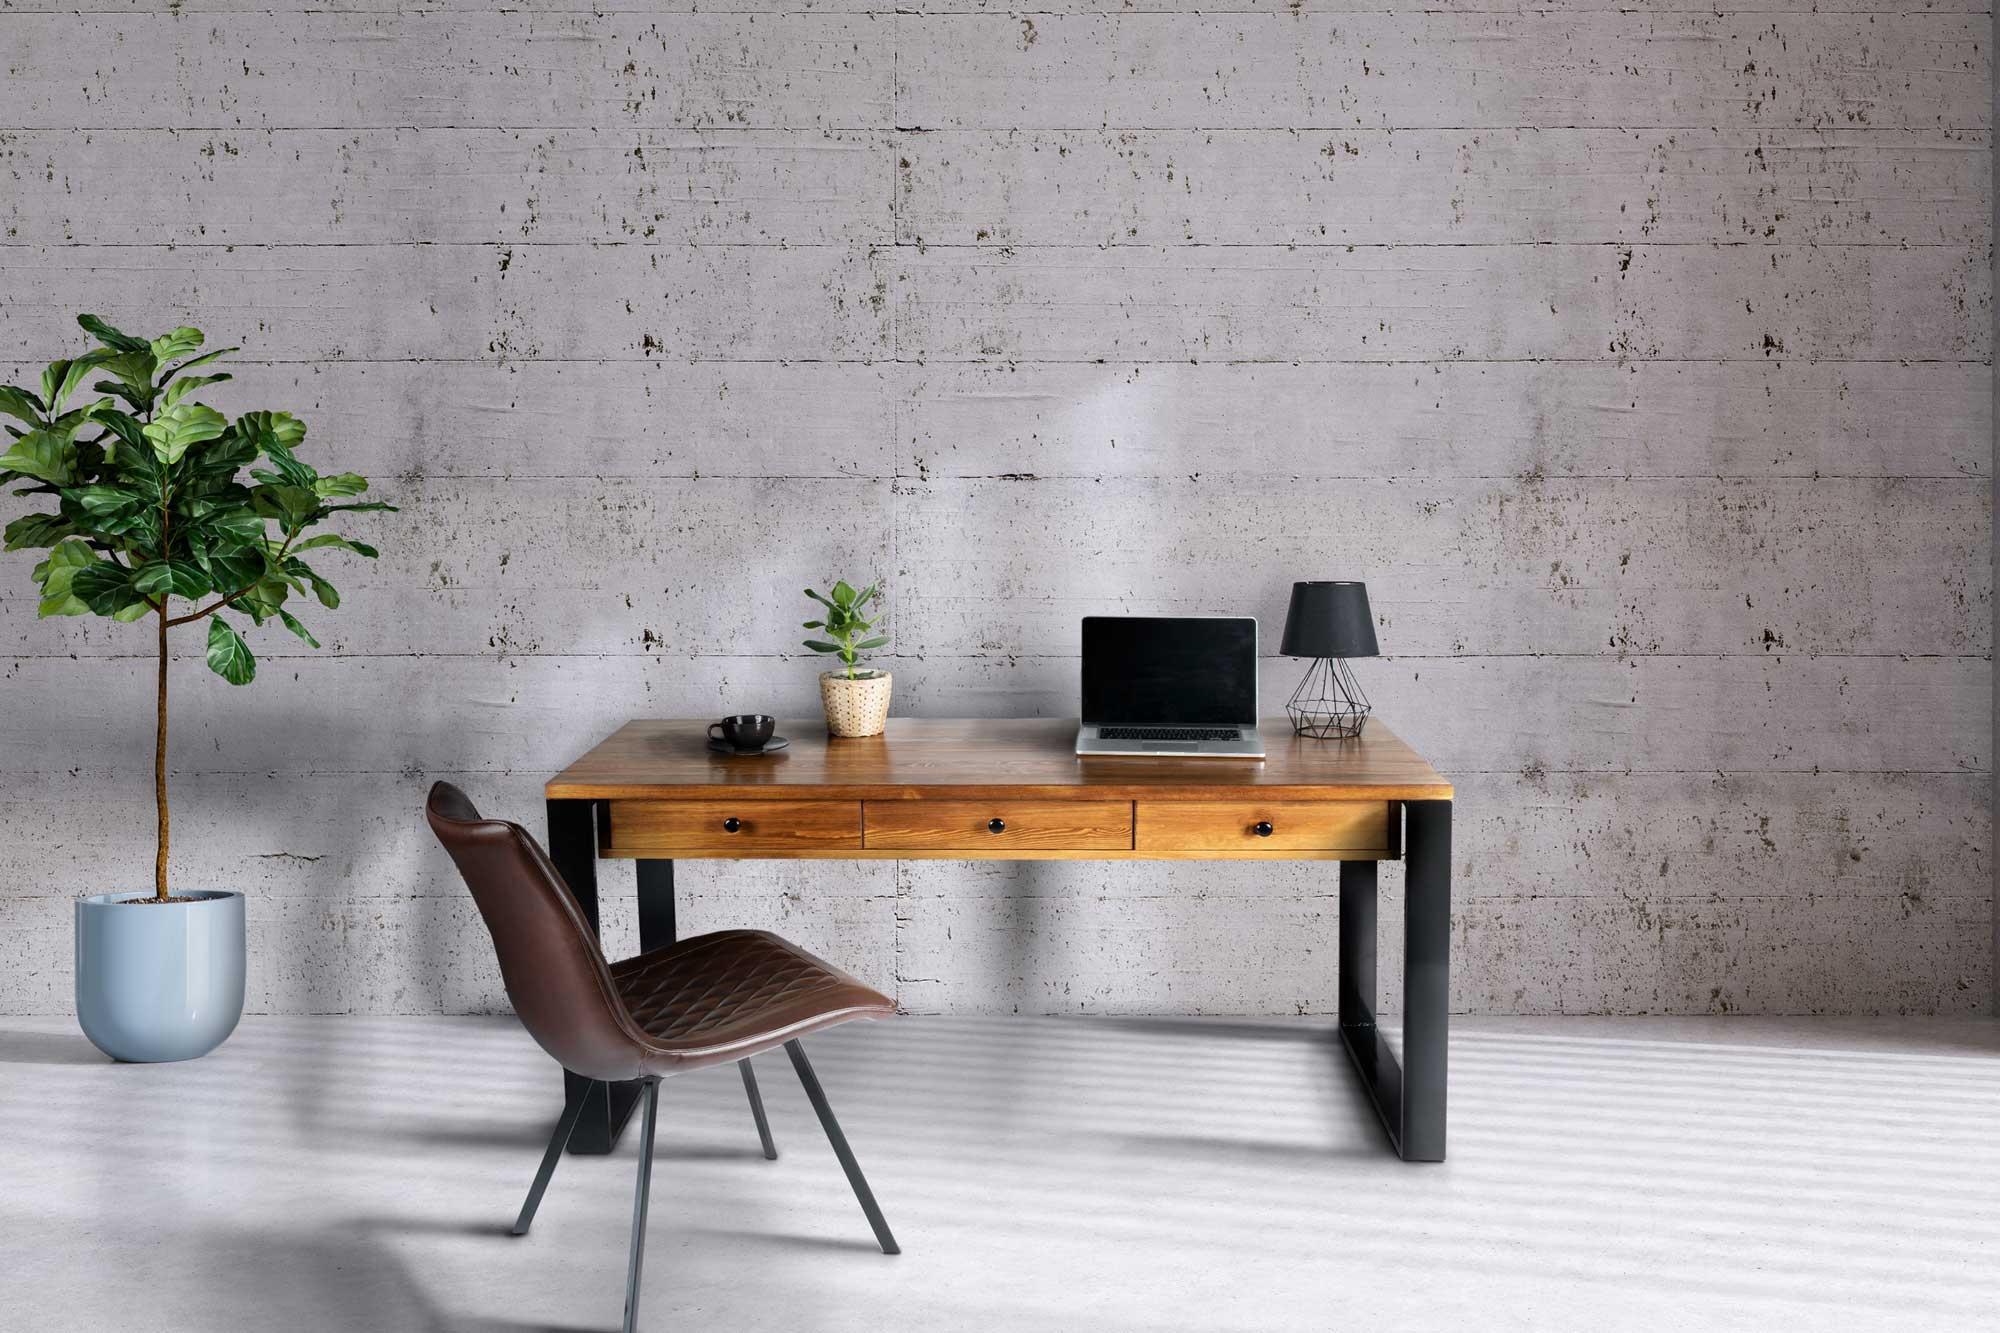 Biurka loftowe, producent biurek loftowych, biurka industrialne